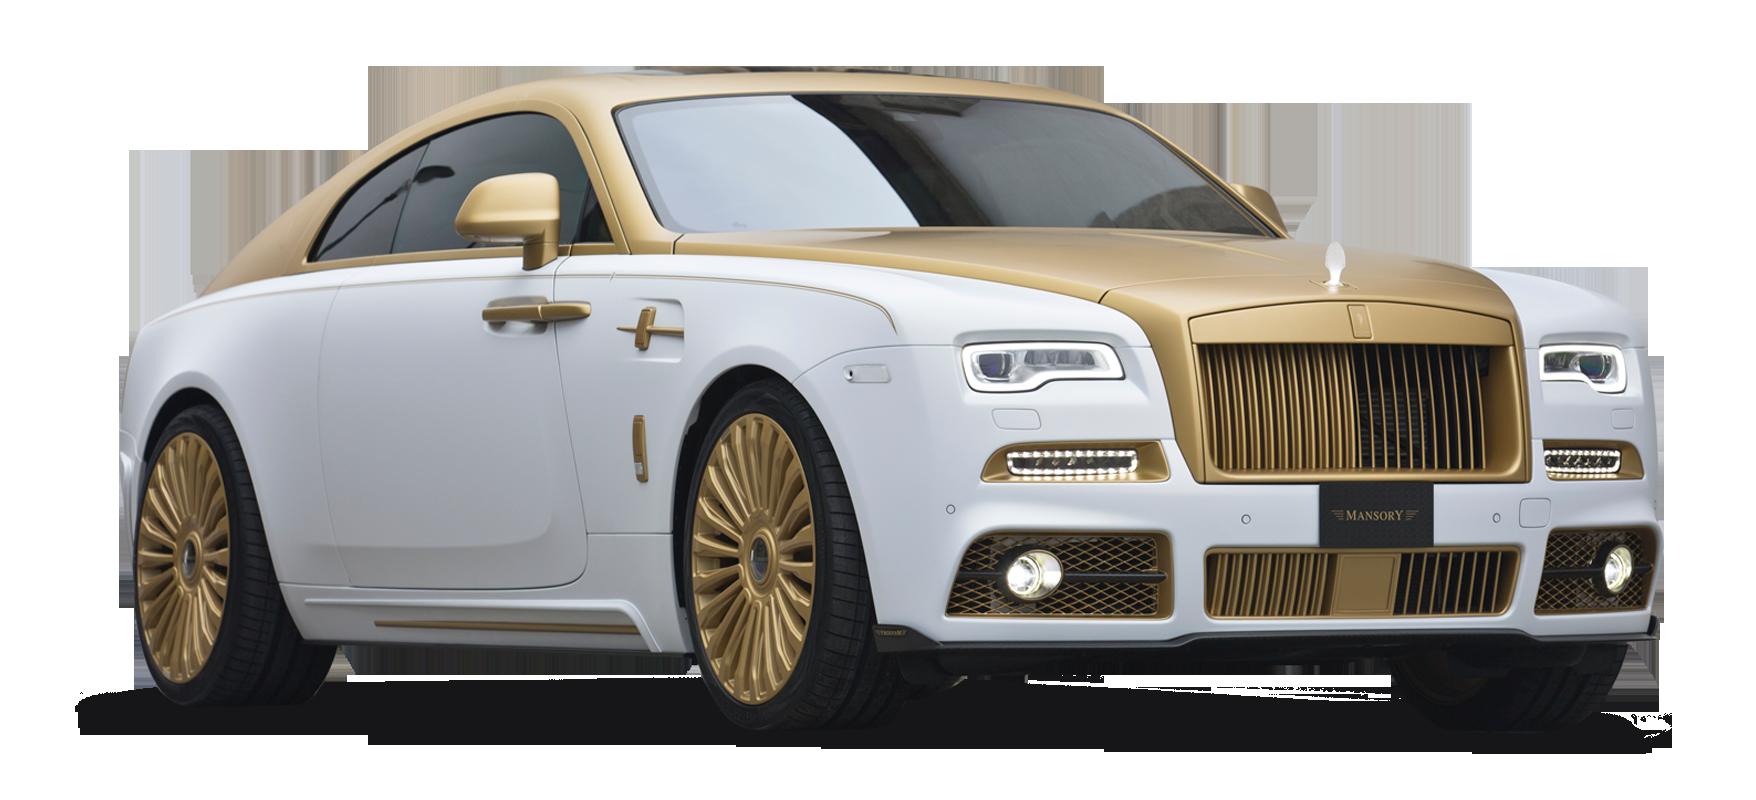 Rolls Royce Car Png Image Rolls Royce Rolls Royce Cars Luxury Cars